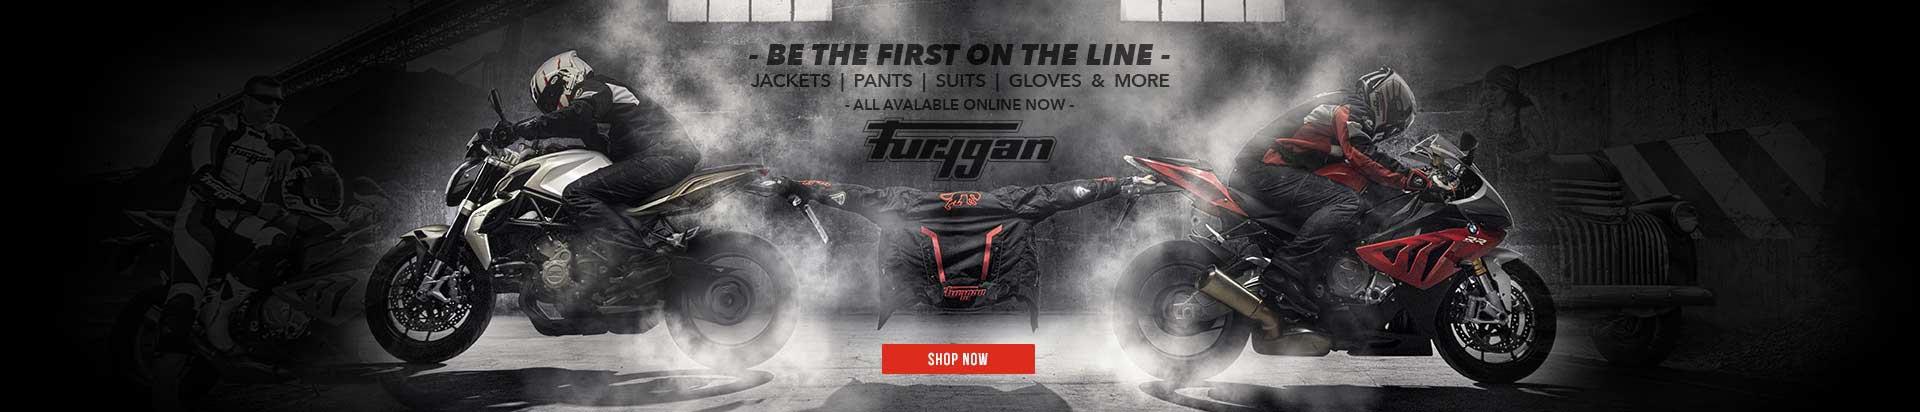 Furygan Clothing Collection